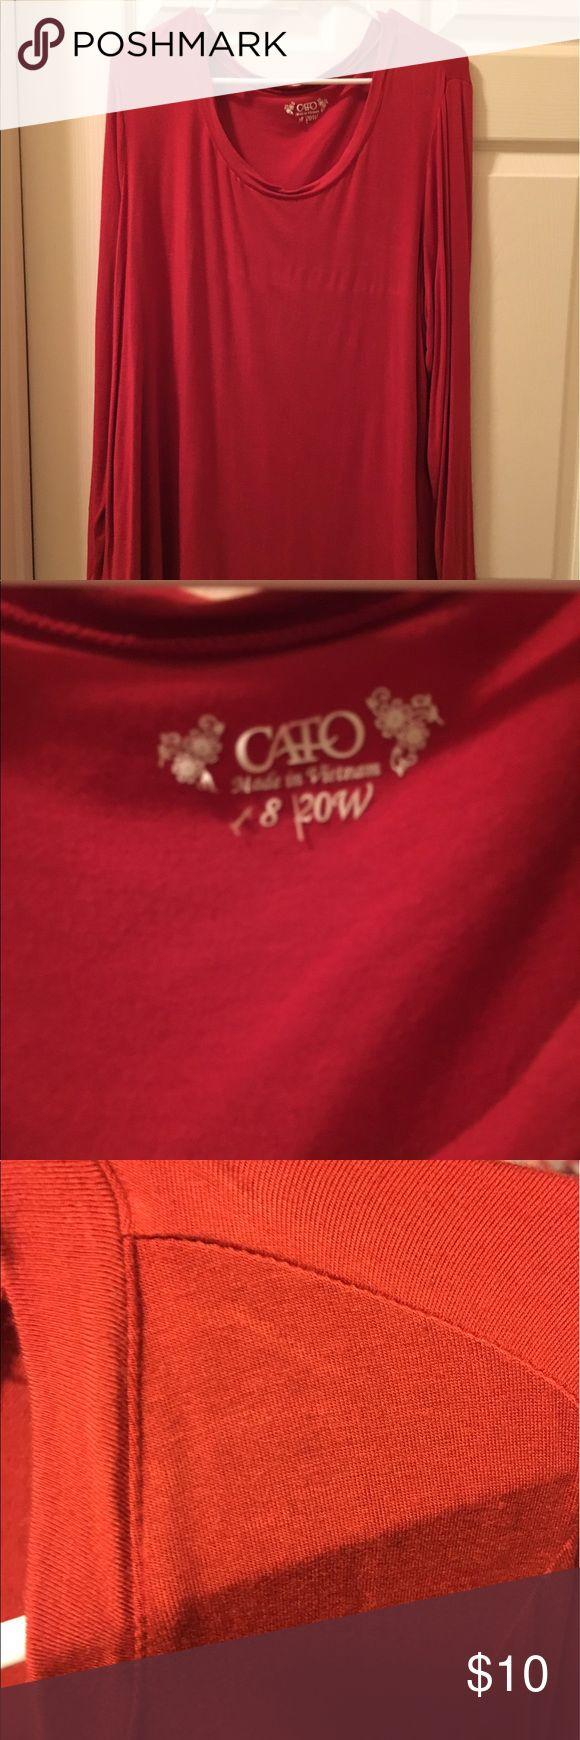 Cato long sleeve top Burnt orange long sleeve tshirt. Last color is the best. Cato Tops Tees - Long Sleeve